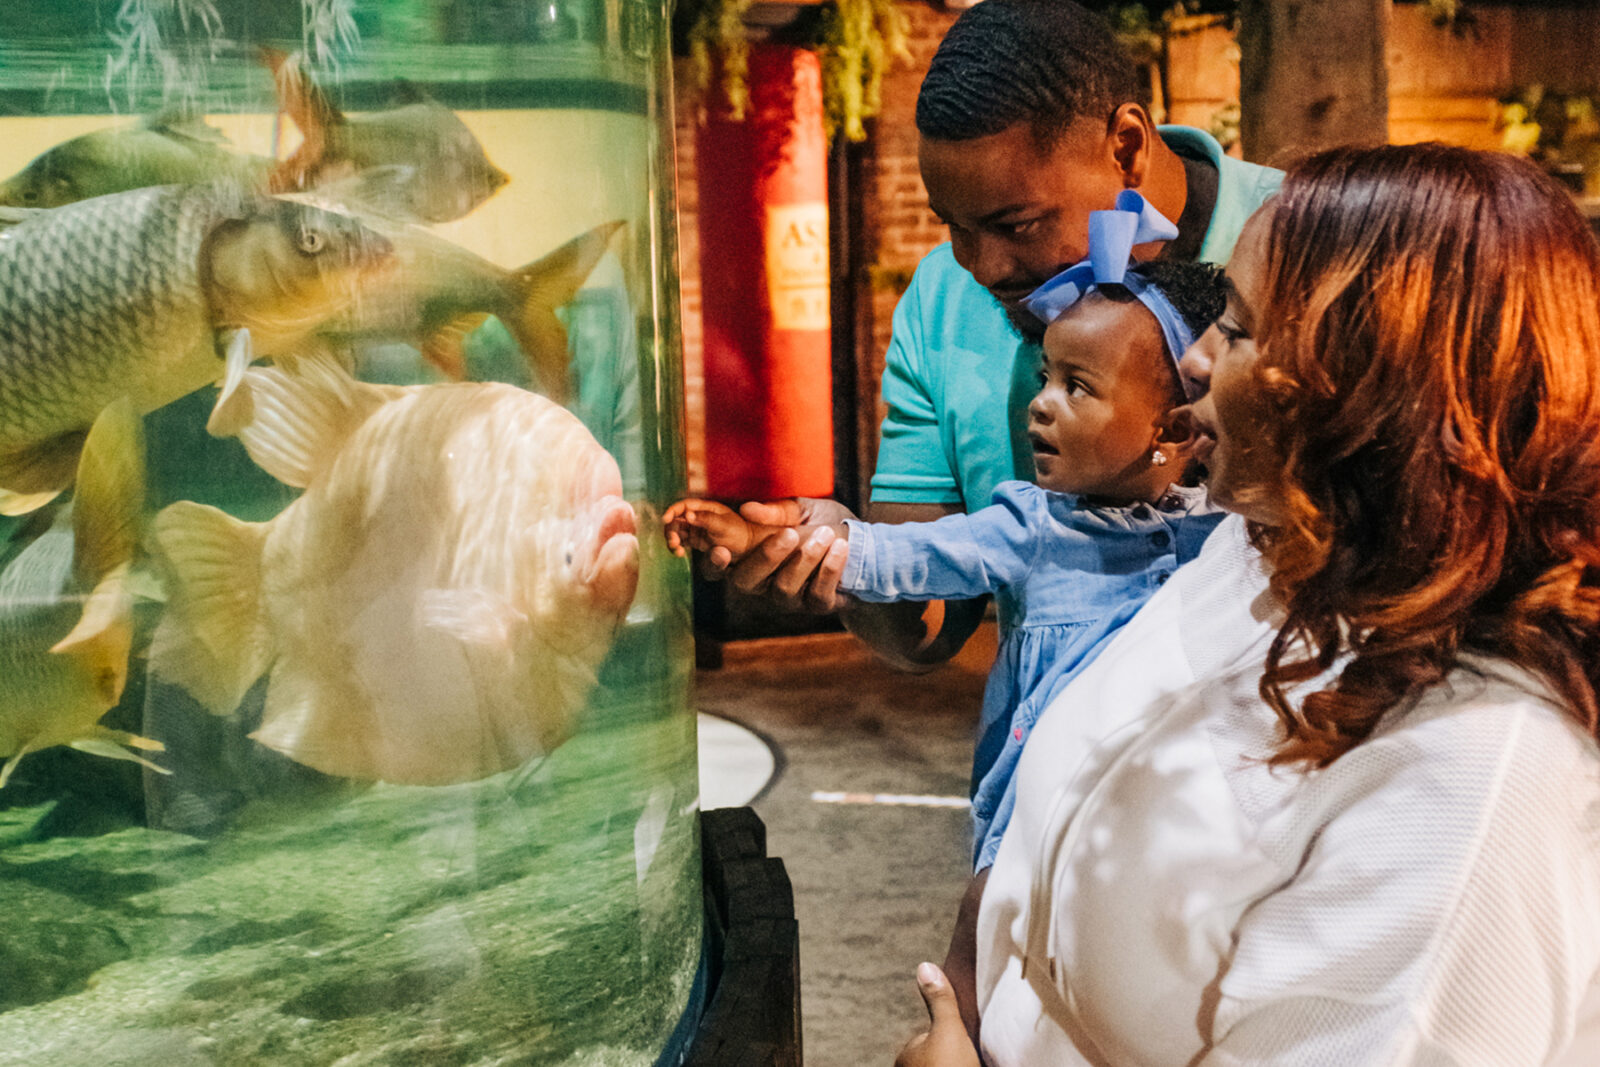 Giant Gourami at Greater Cleveland Aquarium